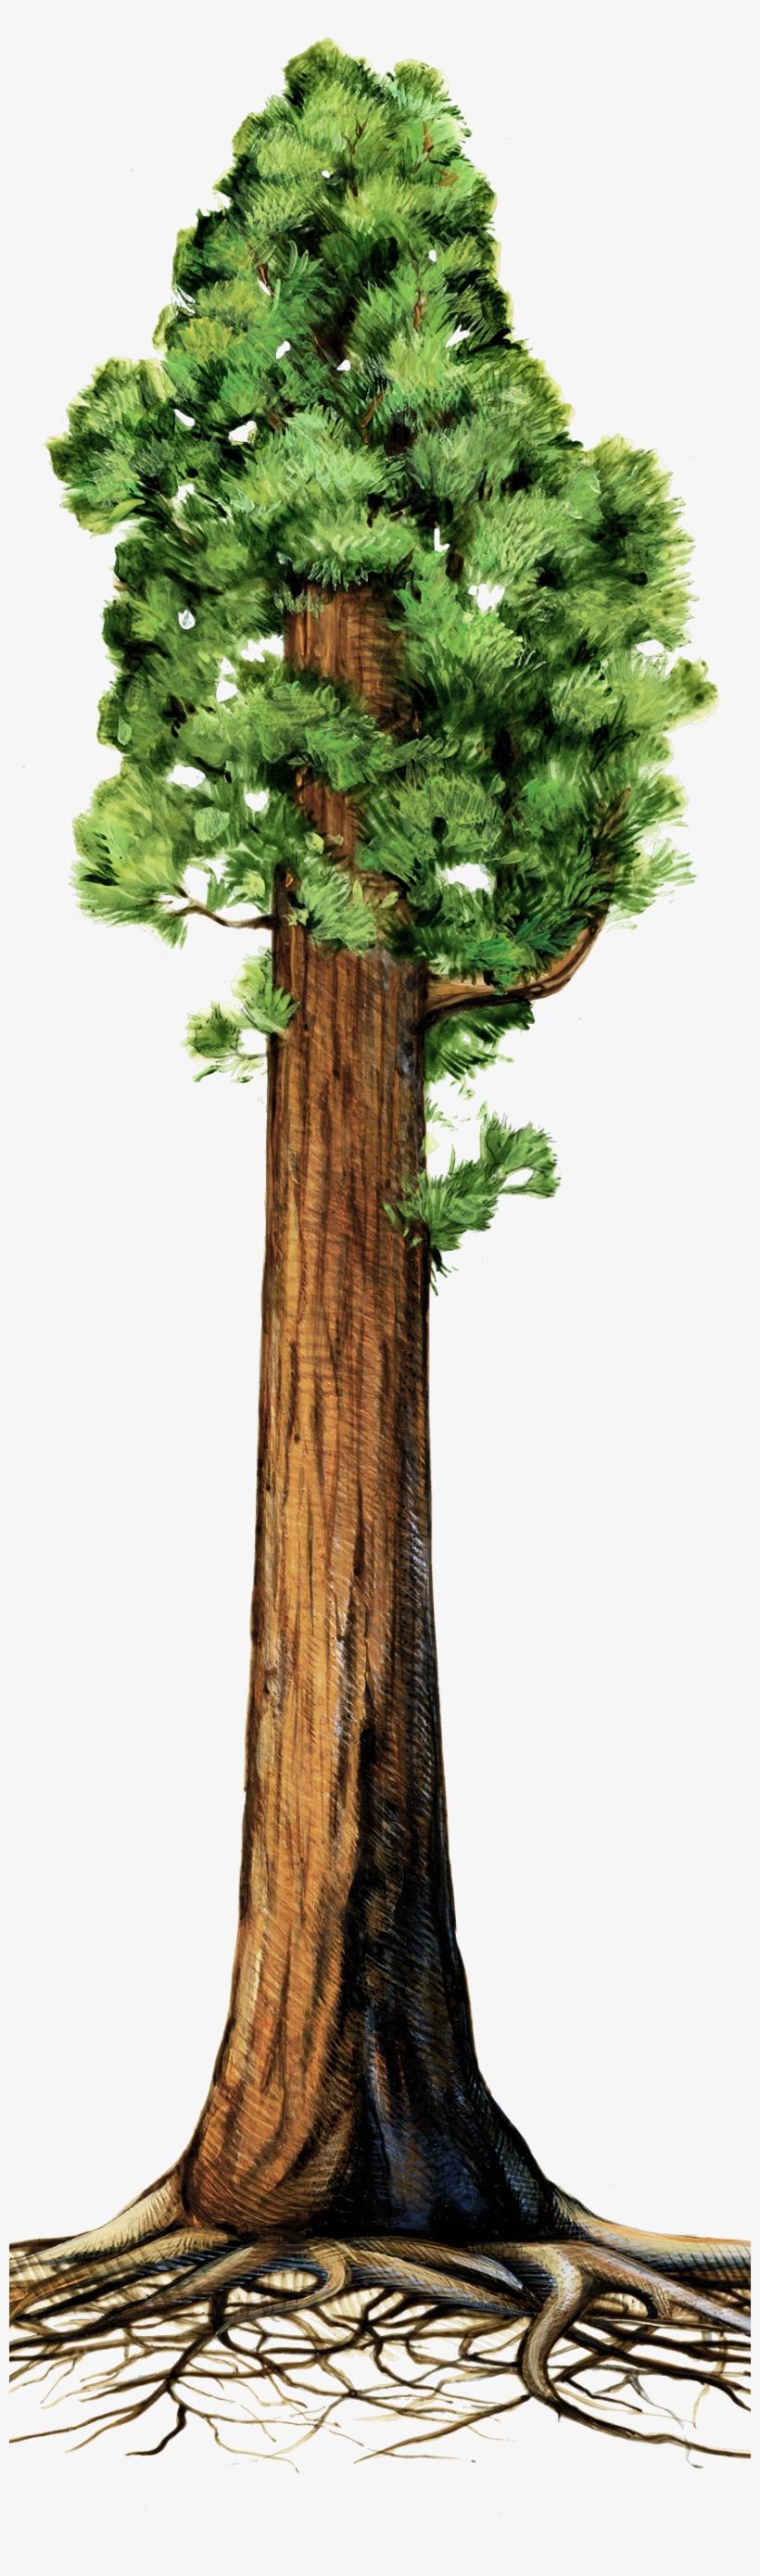 Drawn Roots Sequoia Tree.